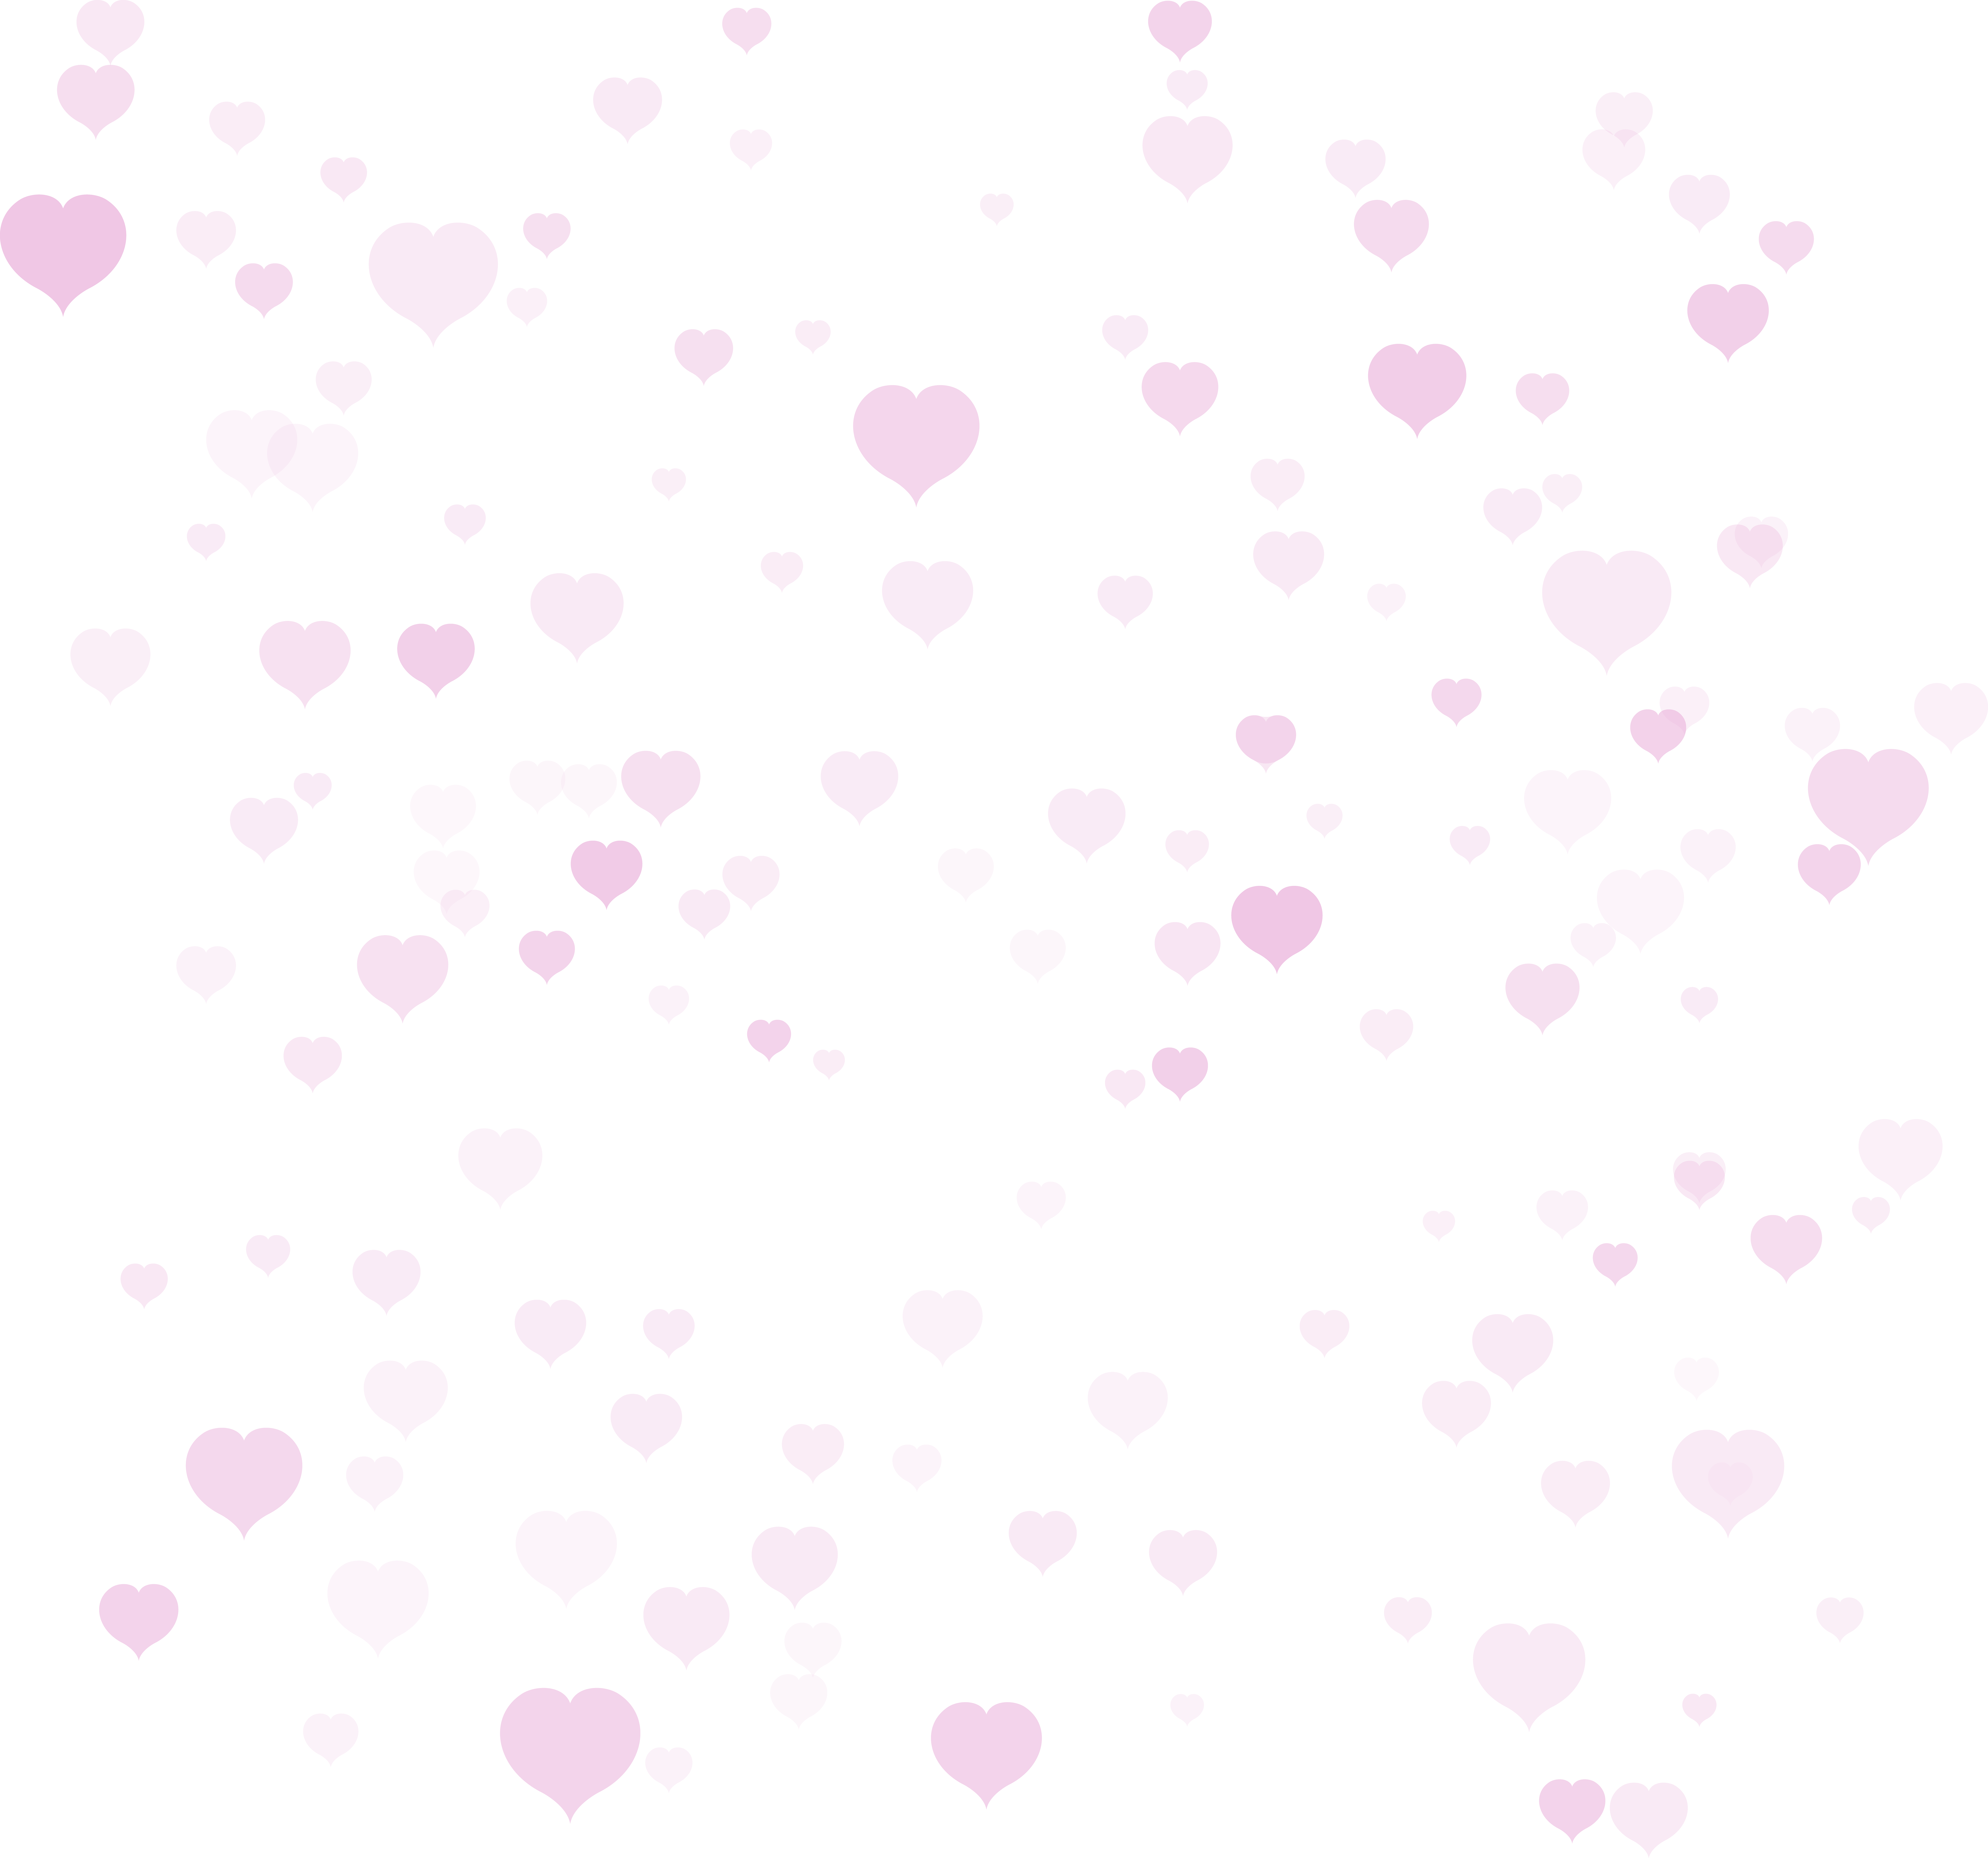 Lavender heart clipart clip art transparent library Hearts for Background Transparent PNG Clip Art | Gallery ... clip art transparent library